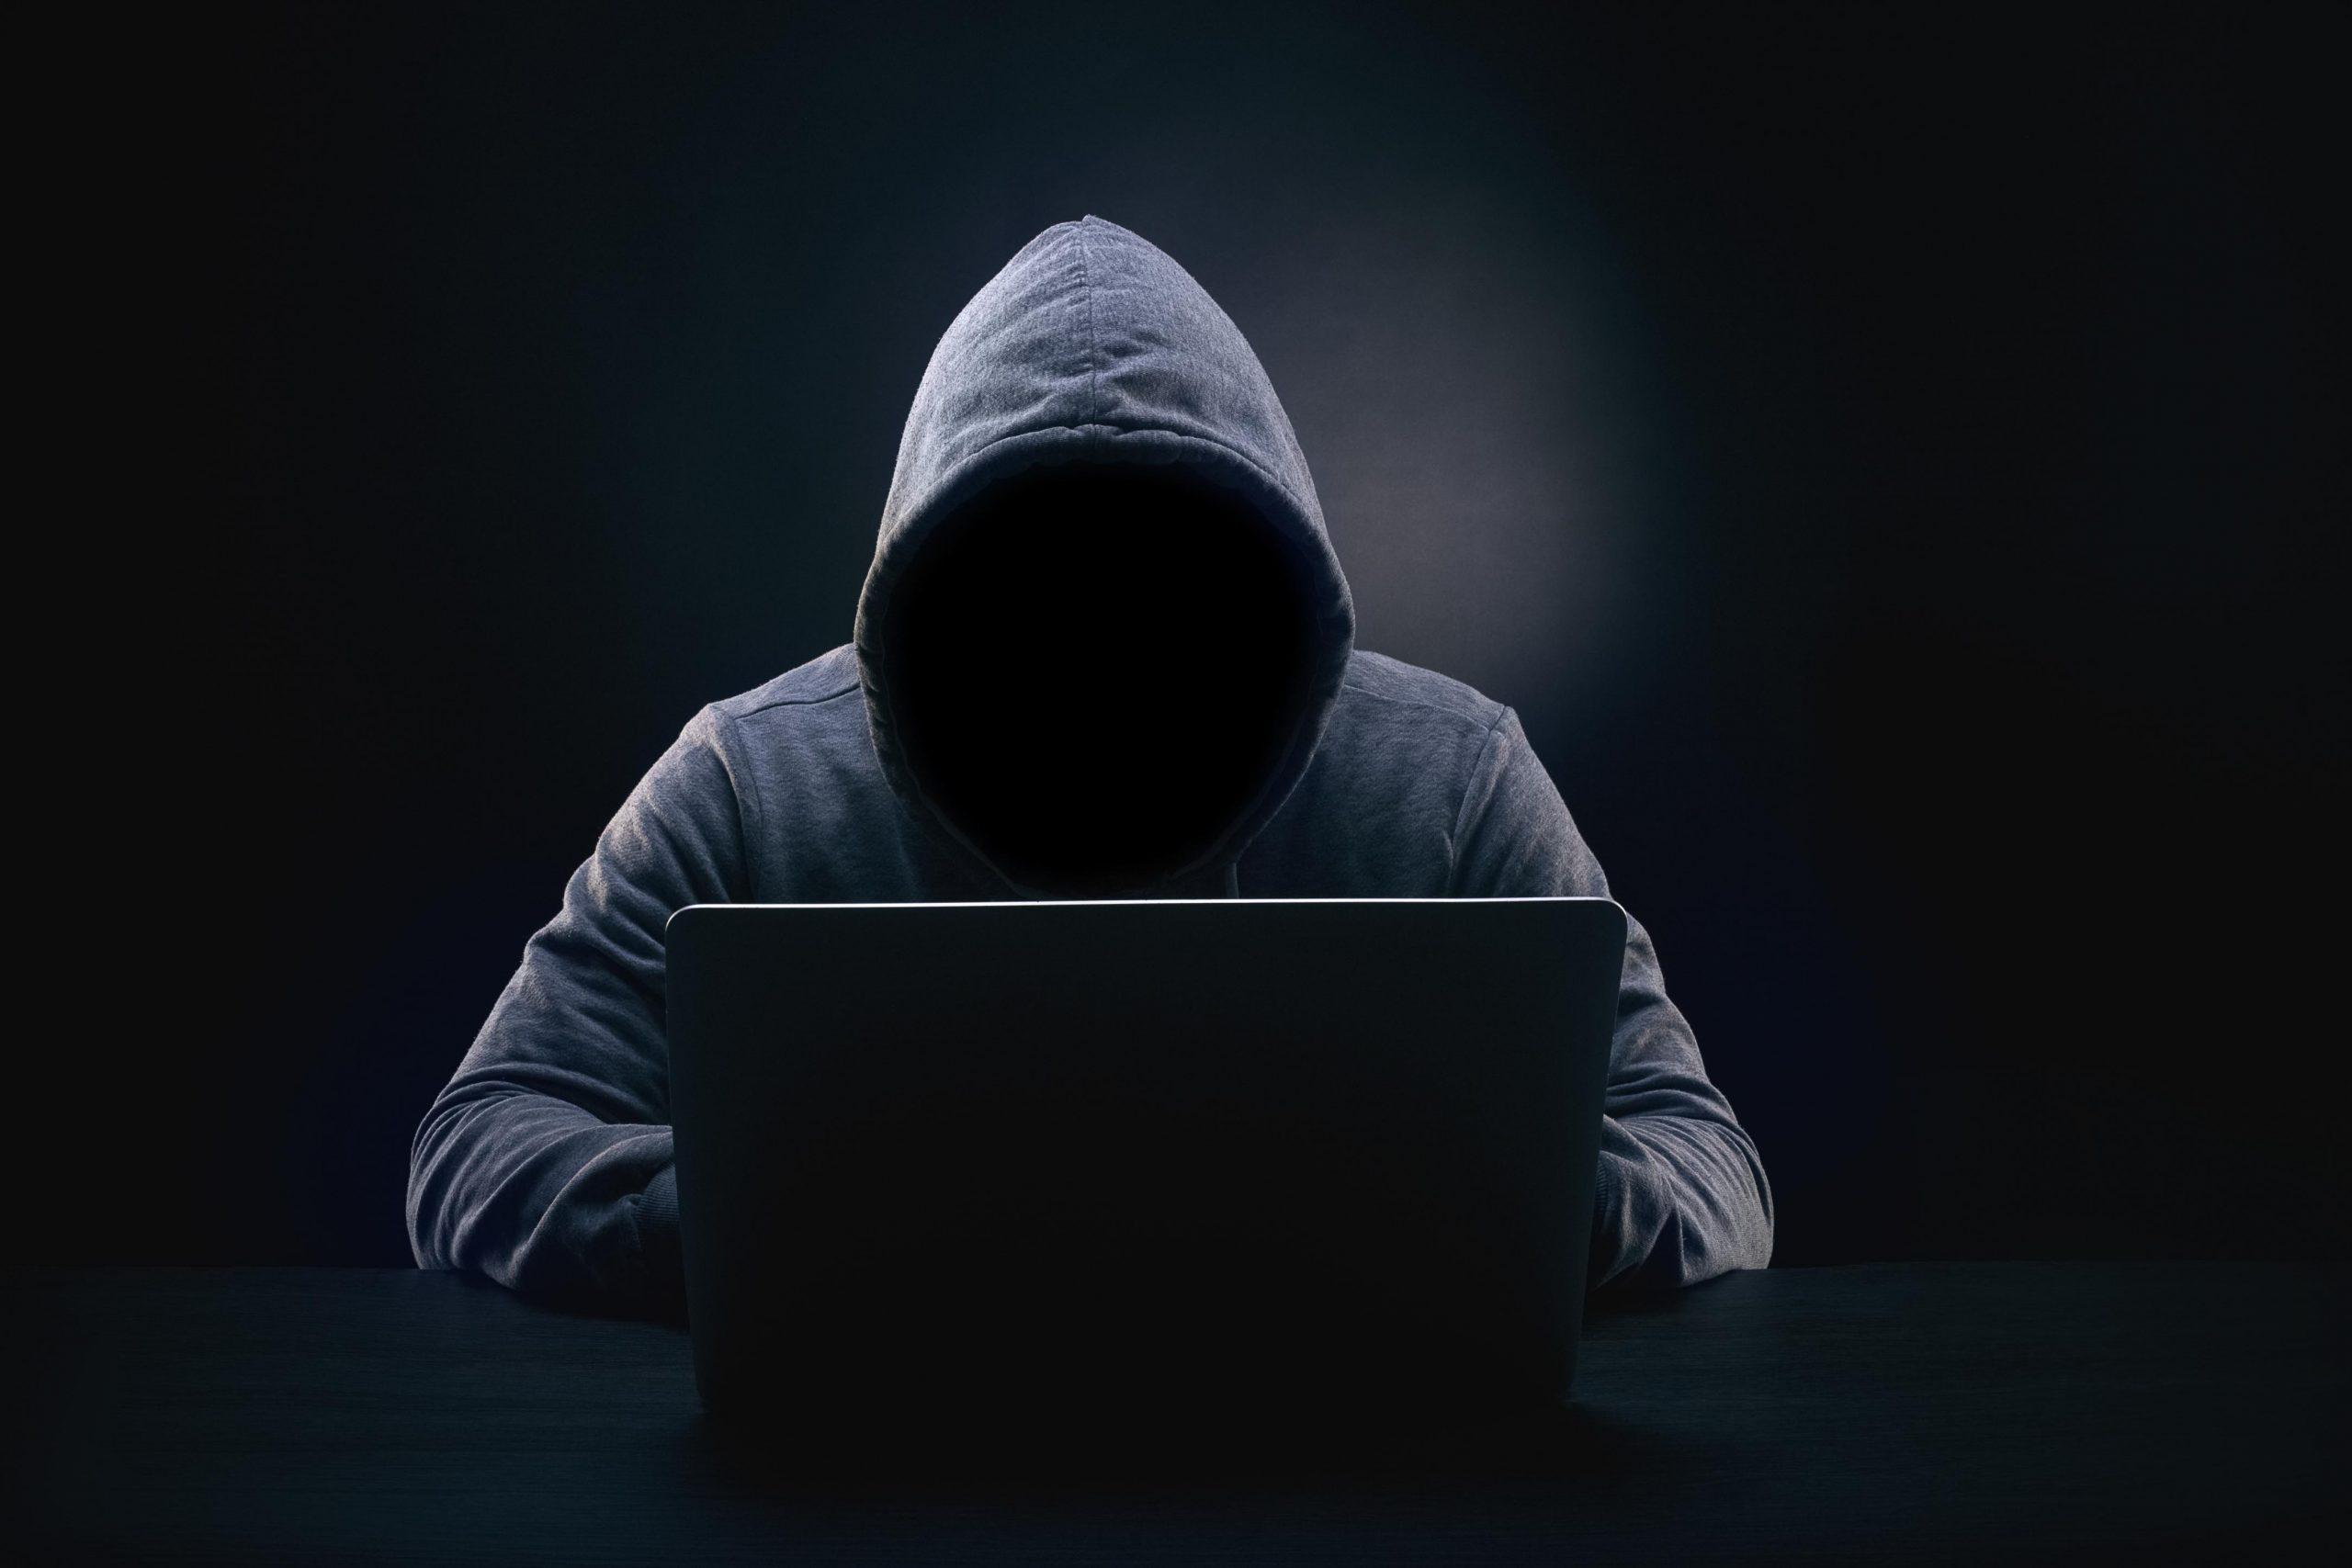 iOS 14.4: Apple corrige falhas exploradas por hackers no iPhone